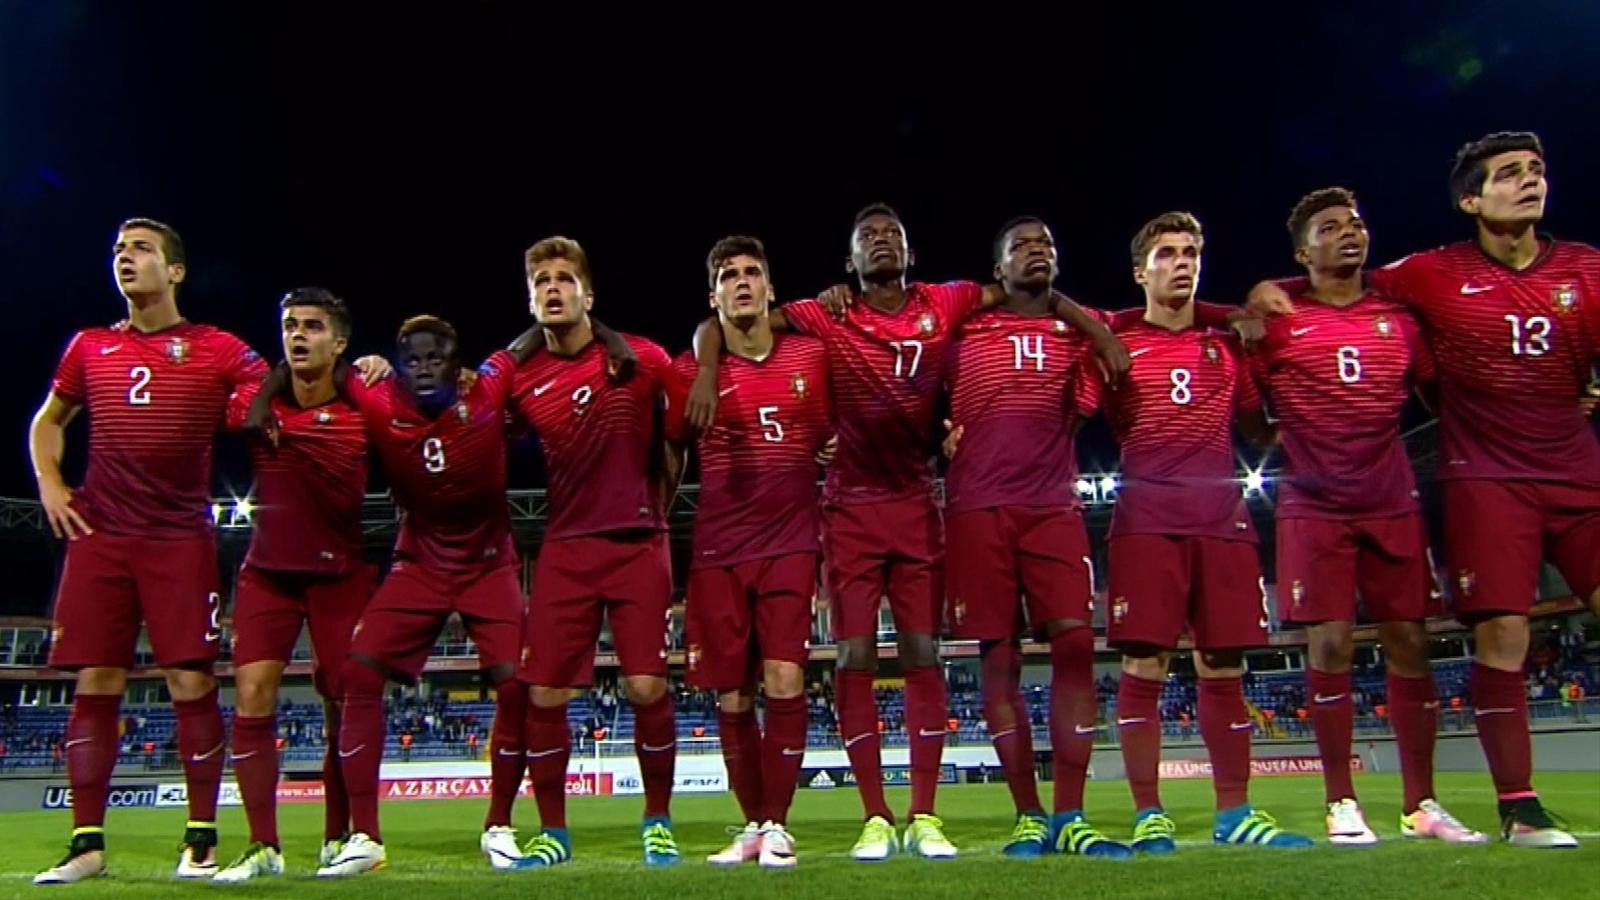 Vid o championnat d 39 europe u17 le portugal est sacr - Calendrier coupe du monde u17 ...